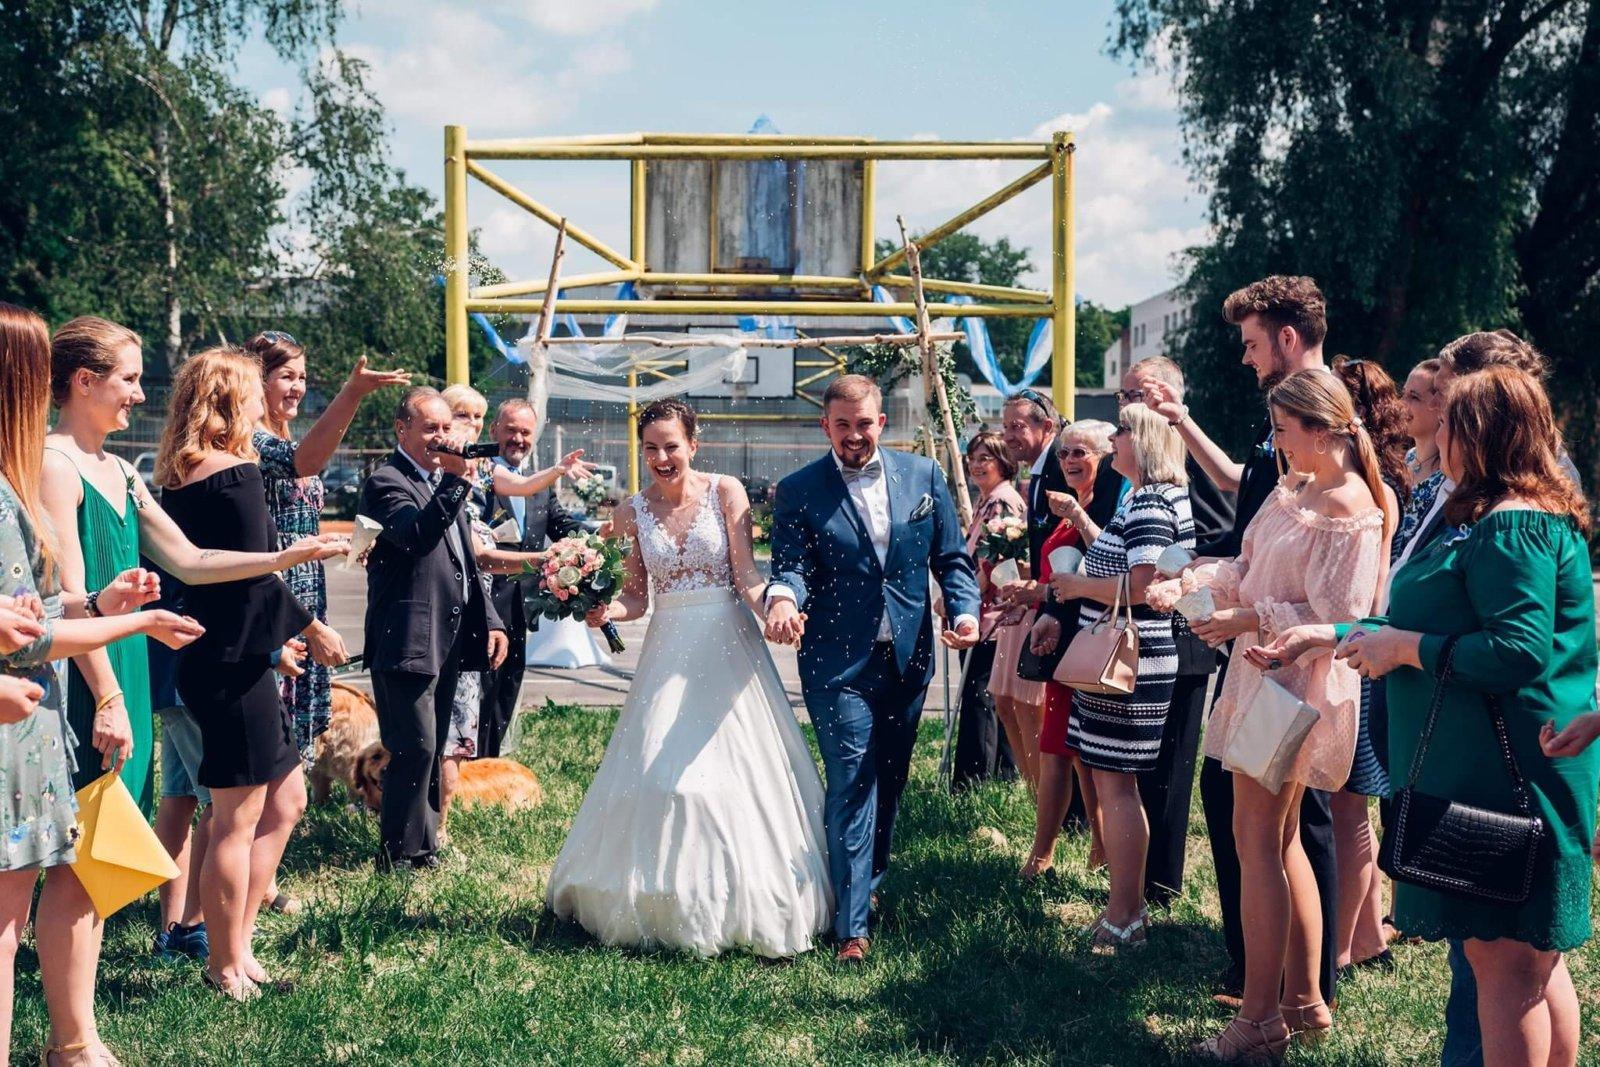 fotograf nymburk, basketbalová svatba, basketball wedding, sportovní svatba, svatba v nymburce